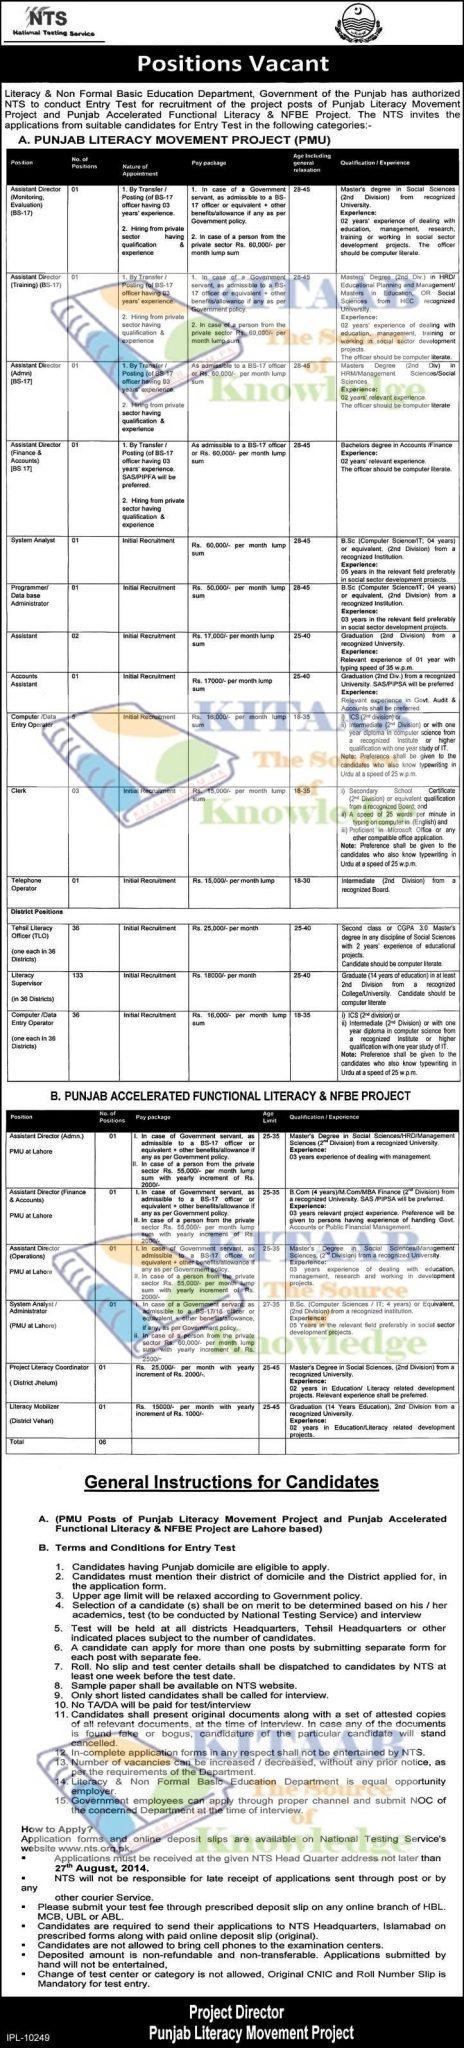 Punjab Govt Literacy & Non Formal Basic Education jobs 2014 Eligibility Criteria Application Form